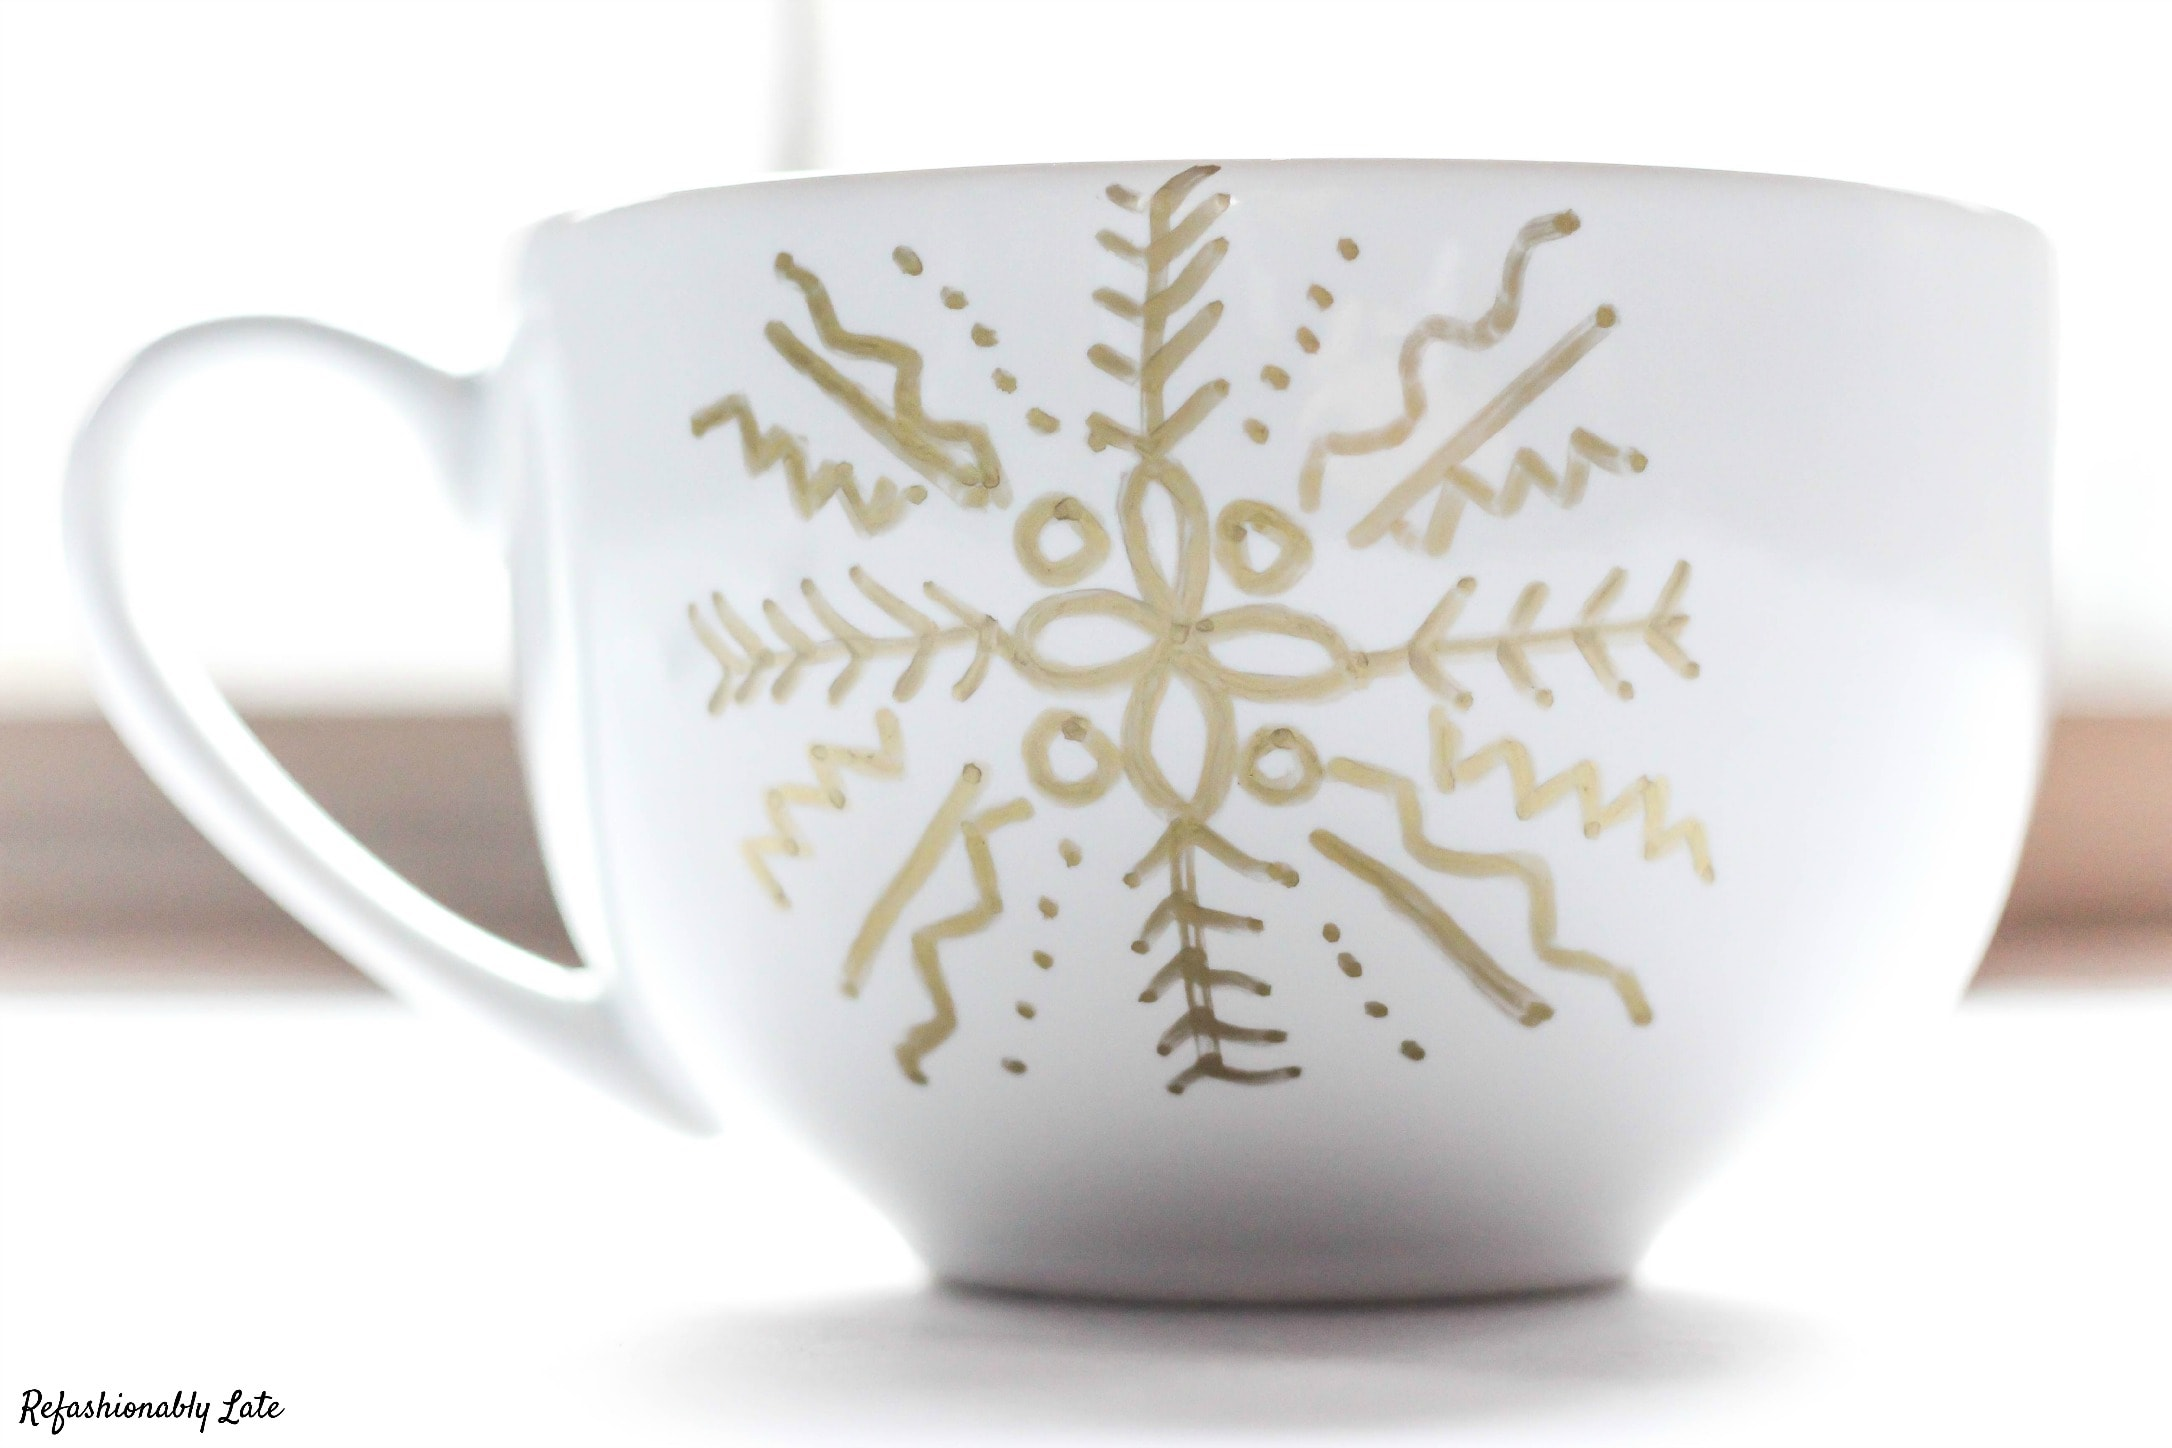 Warming Up During the Holidays - Starbucks Gift Basket - www.refashionablylate.com